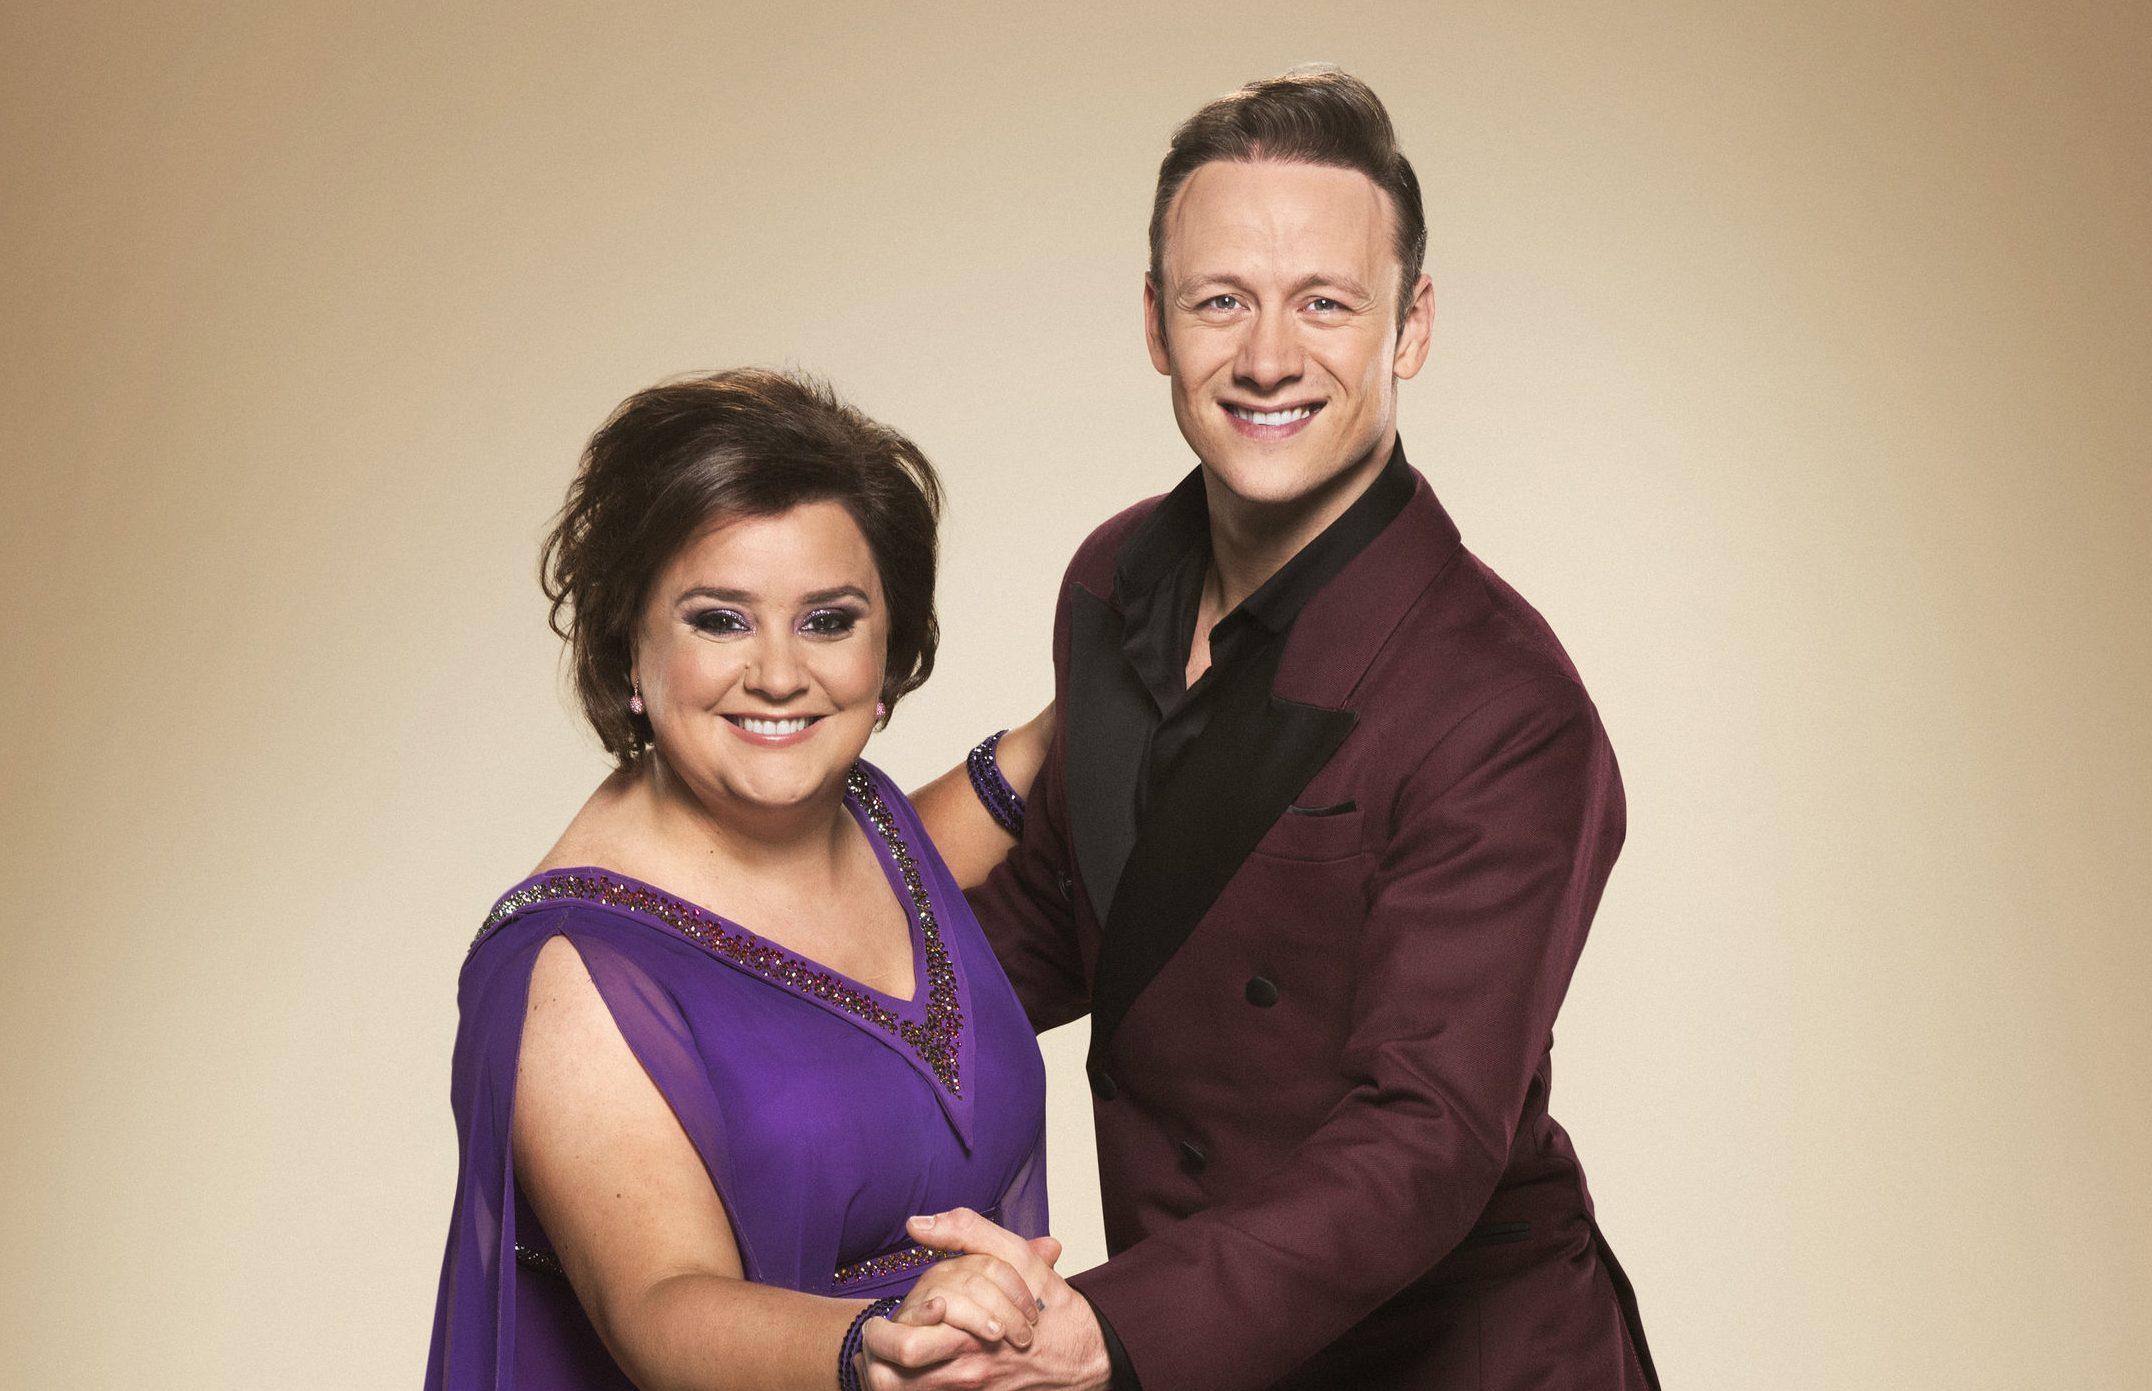 Kevin Clifton and Susan Calman (PA/BBC)